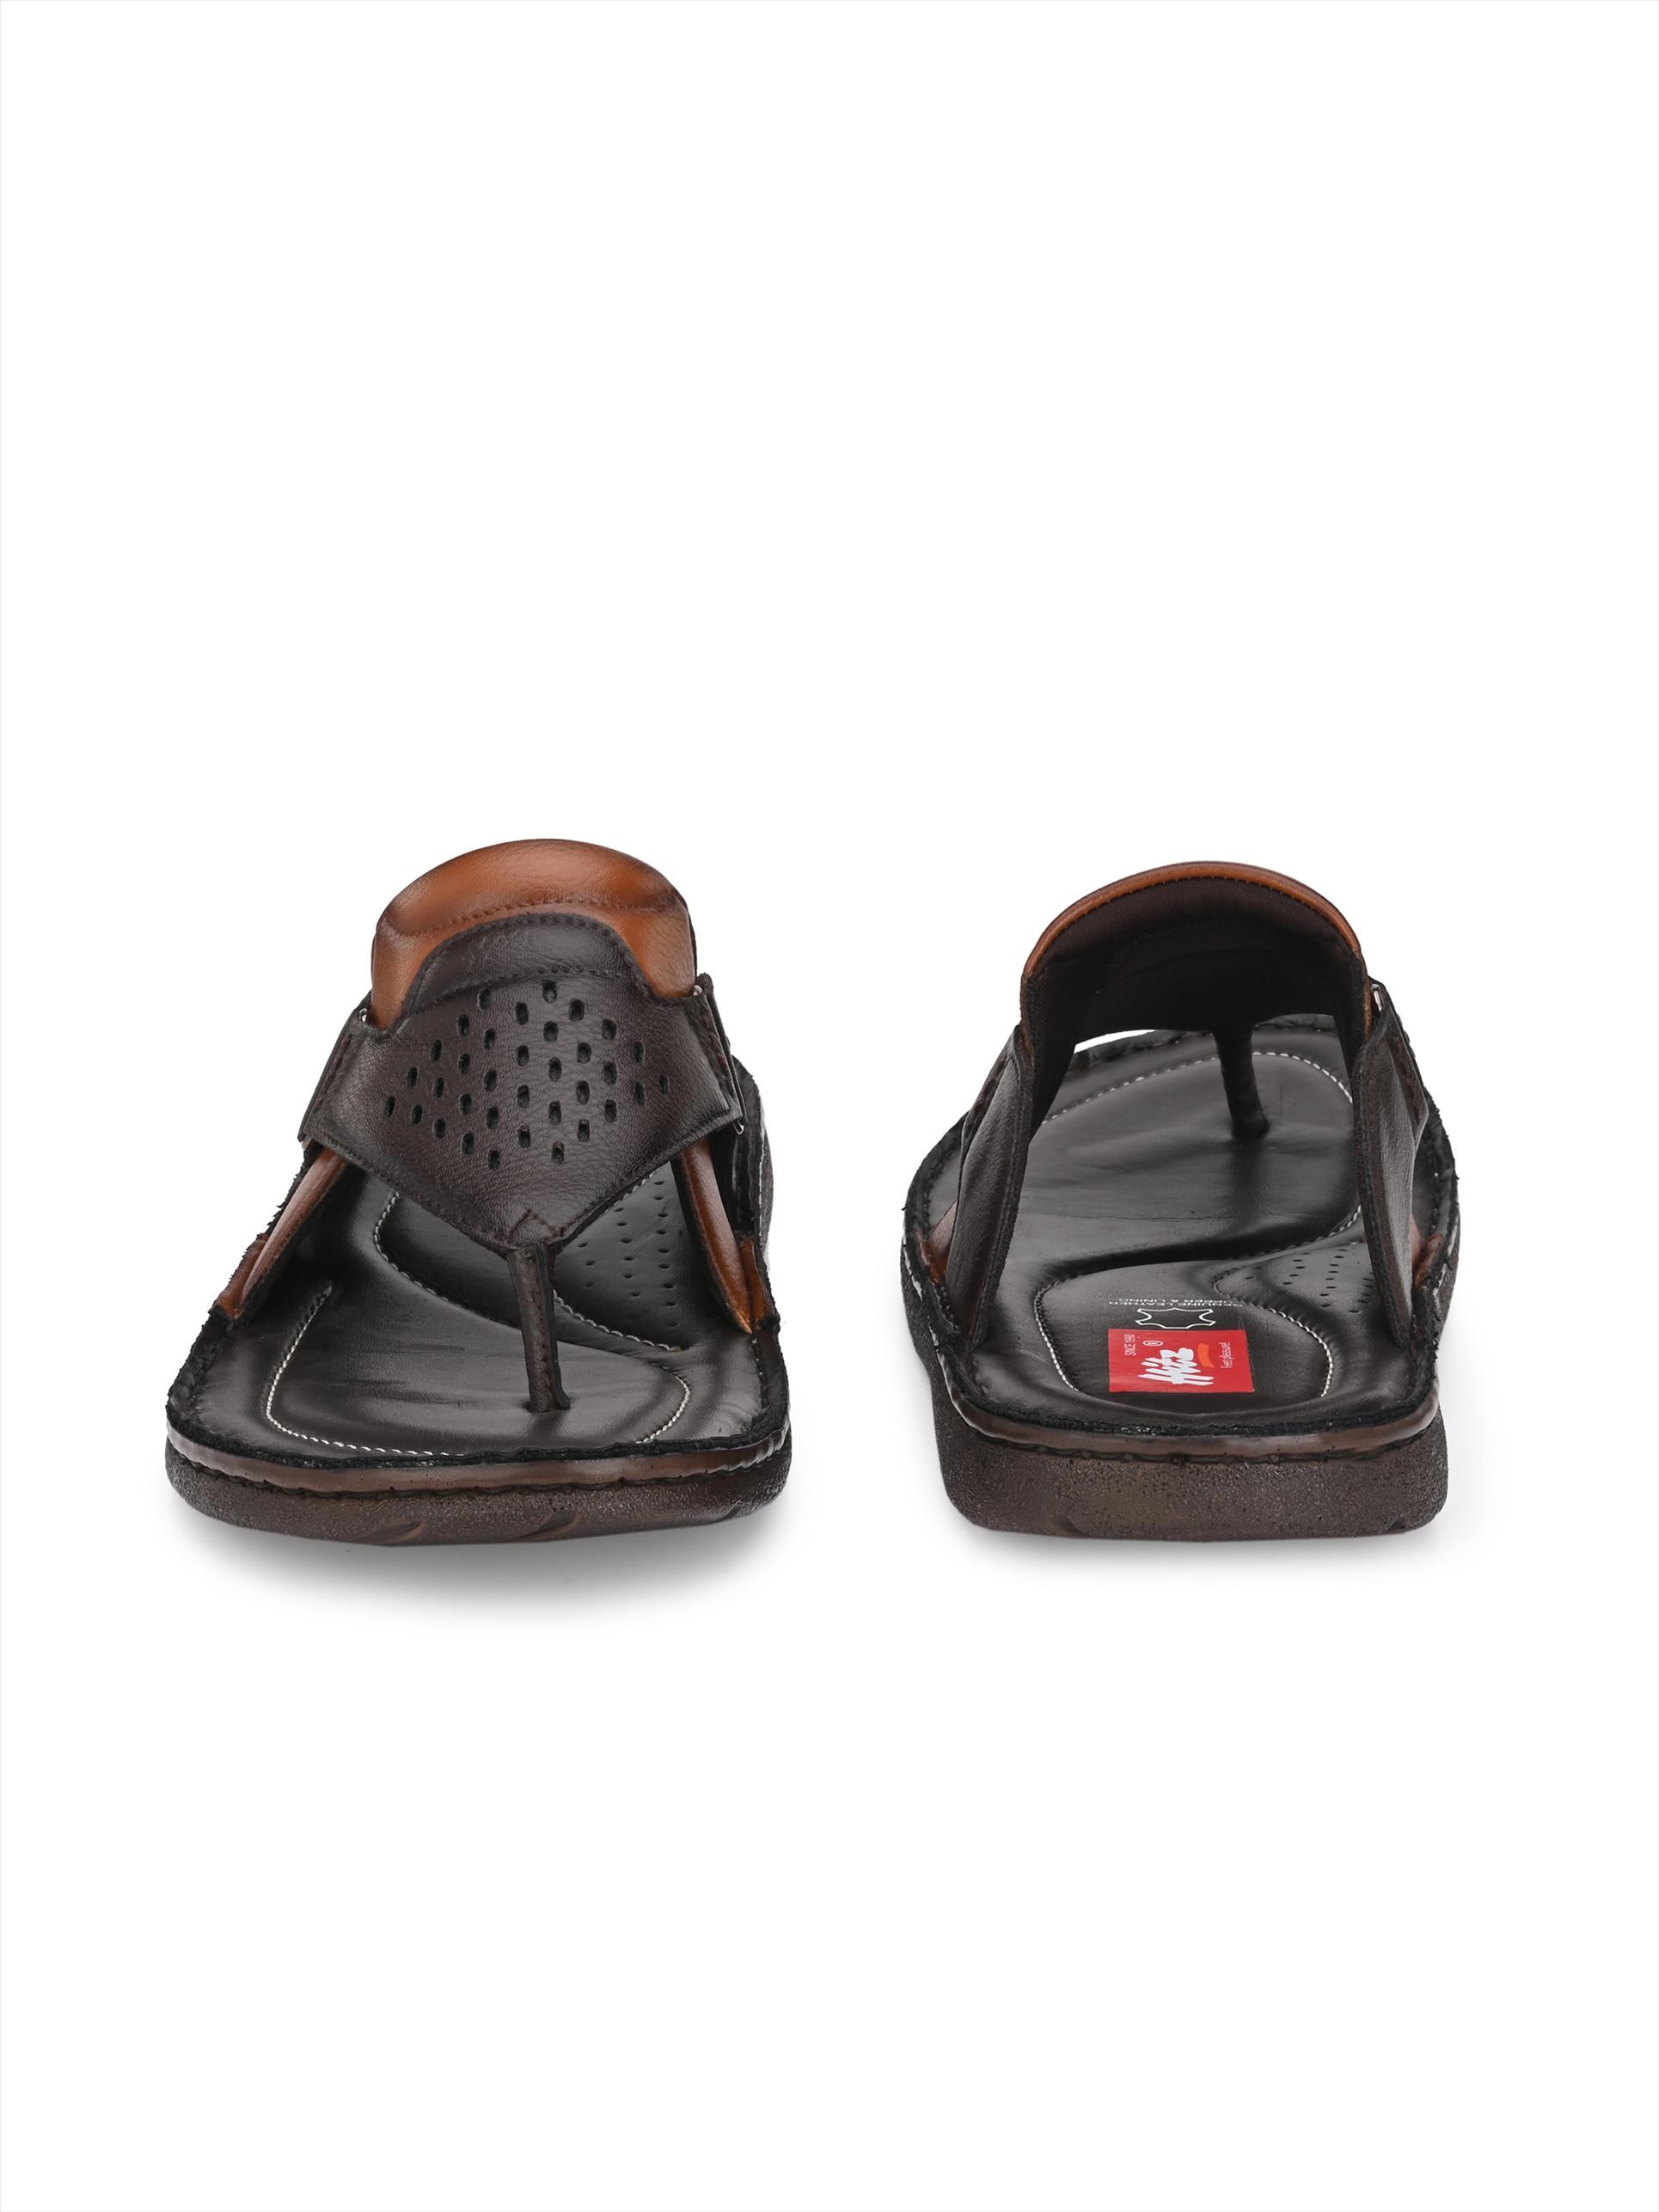 Hitz | Hitz Brown Daily Wear Slippers For Men